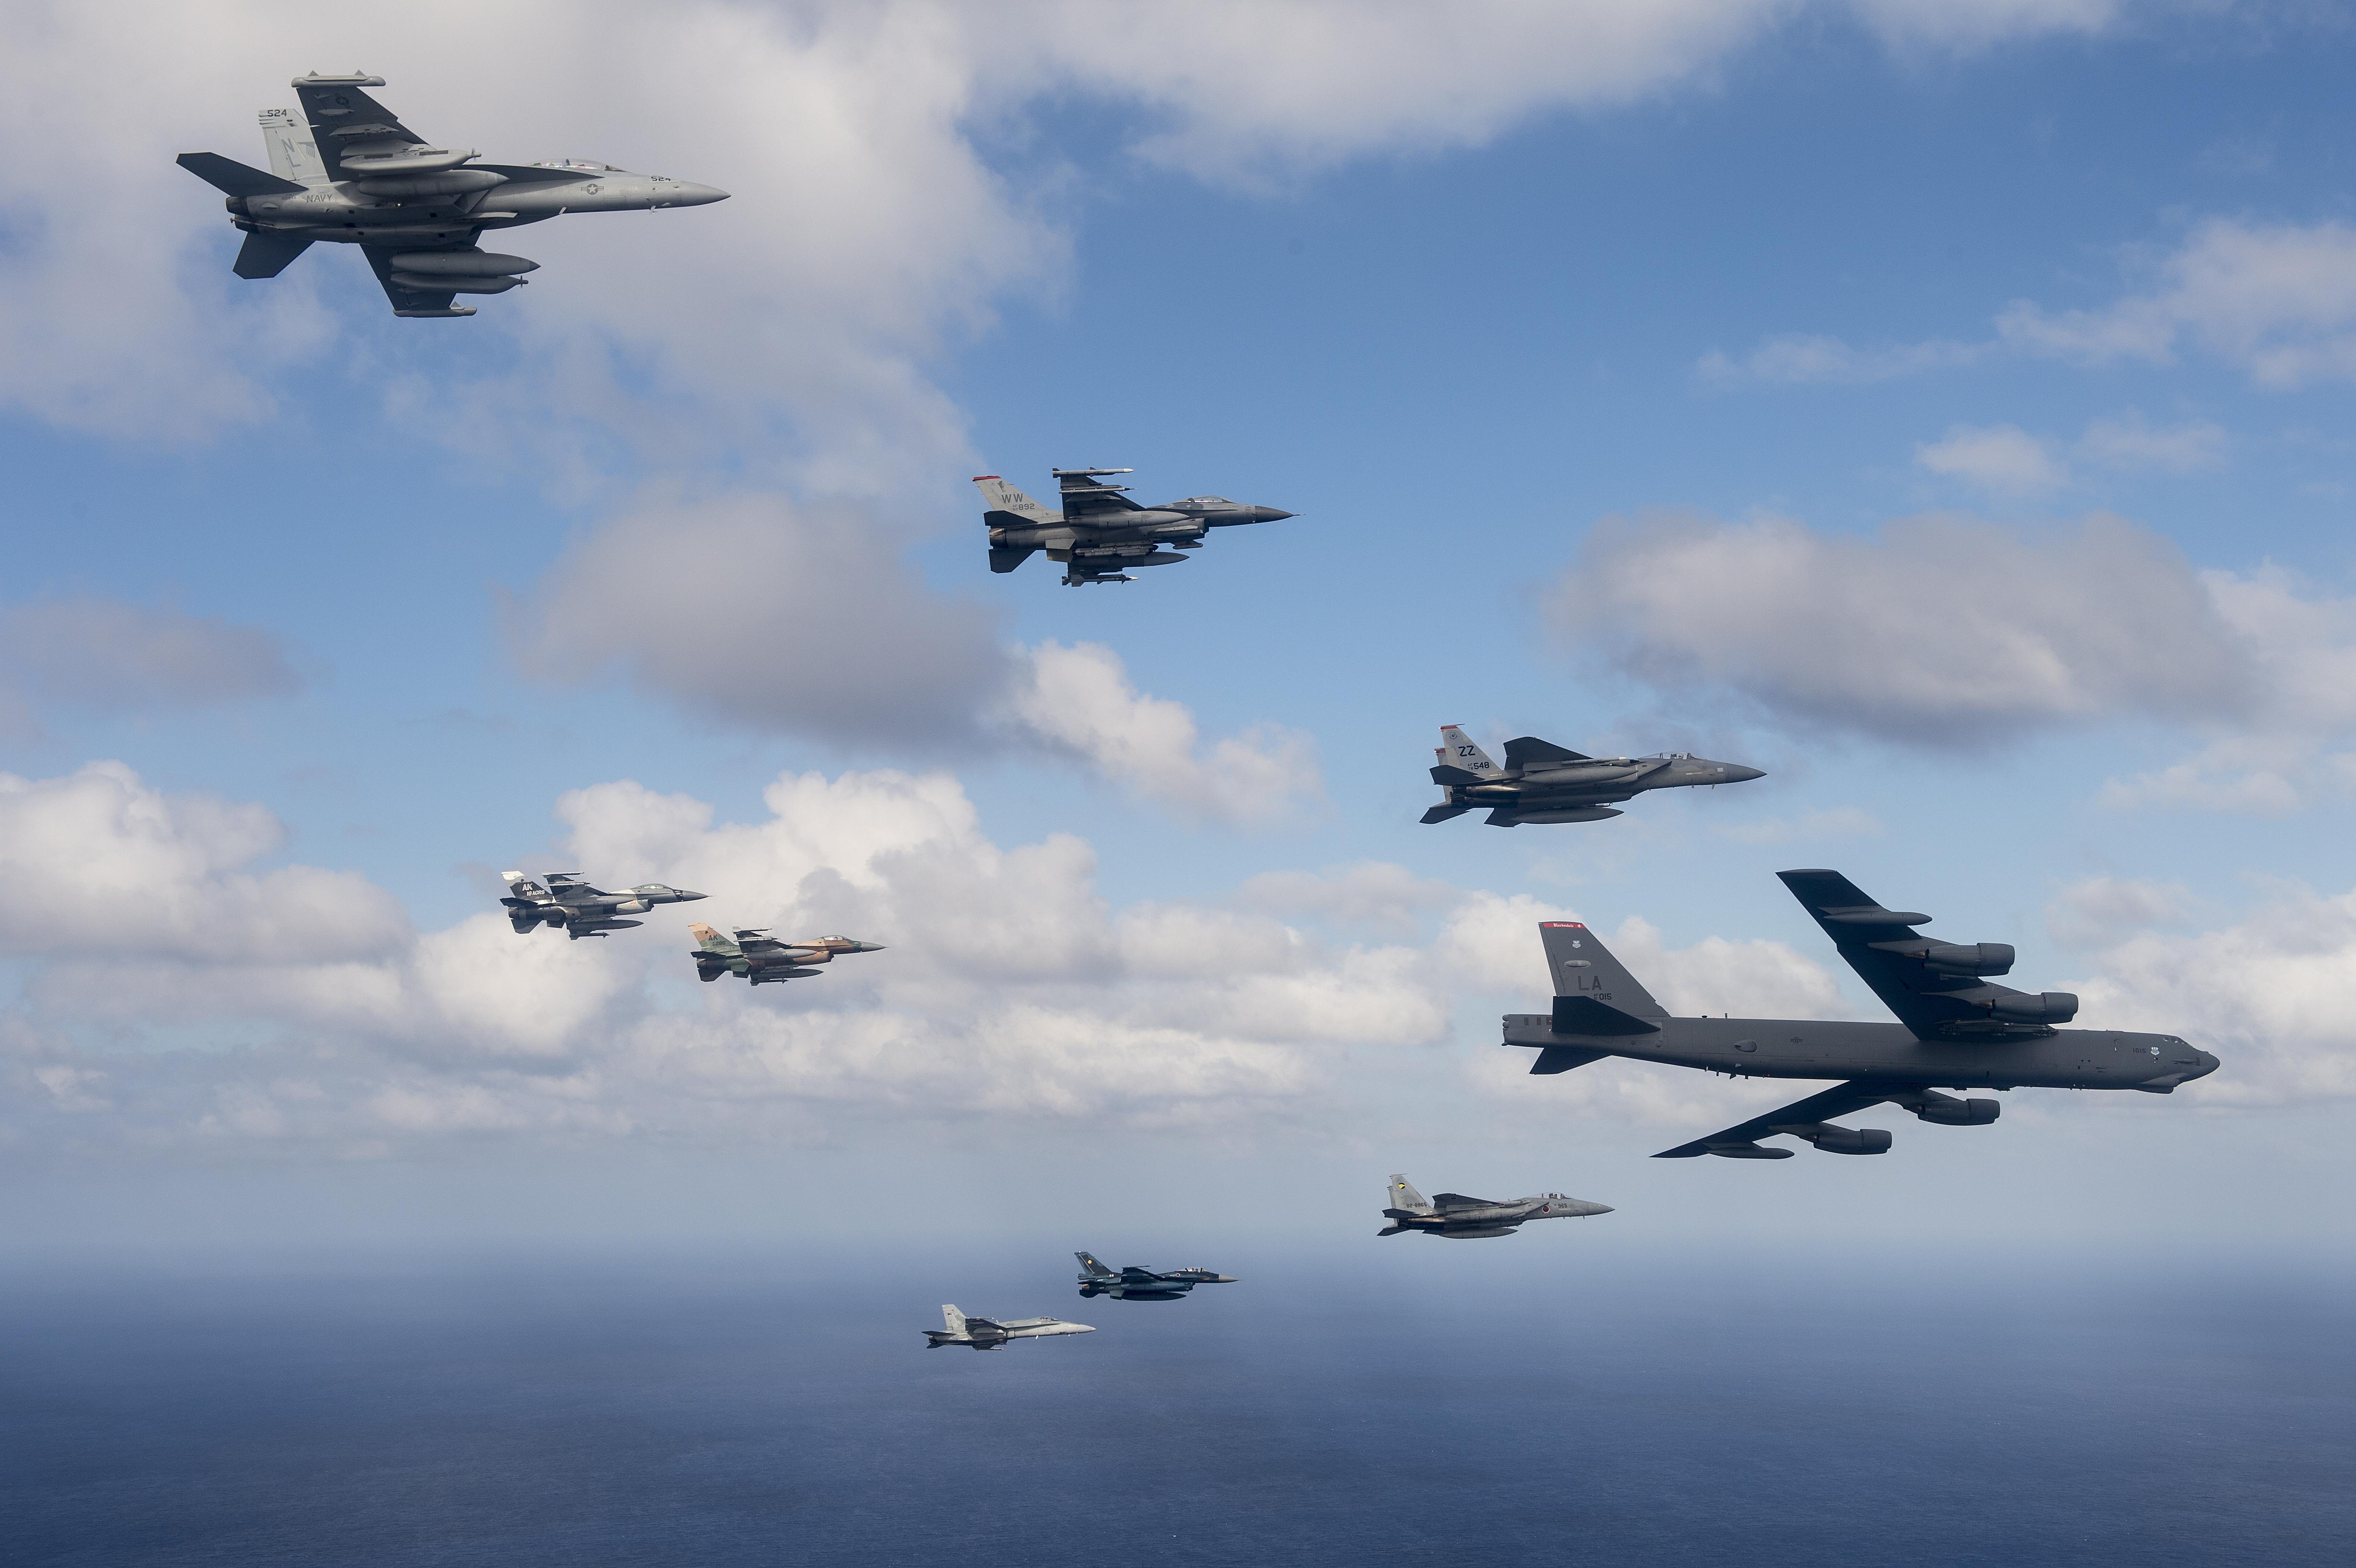 File:Air superiority (16626151685).jpg - Wikimedia Commons